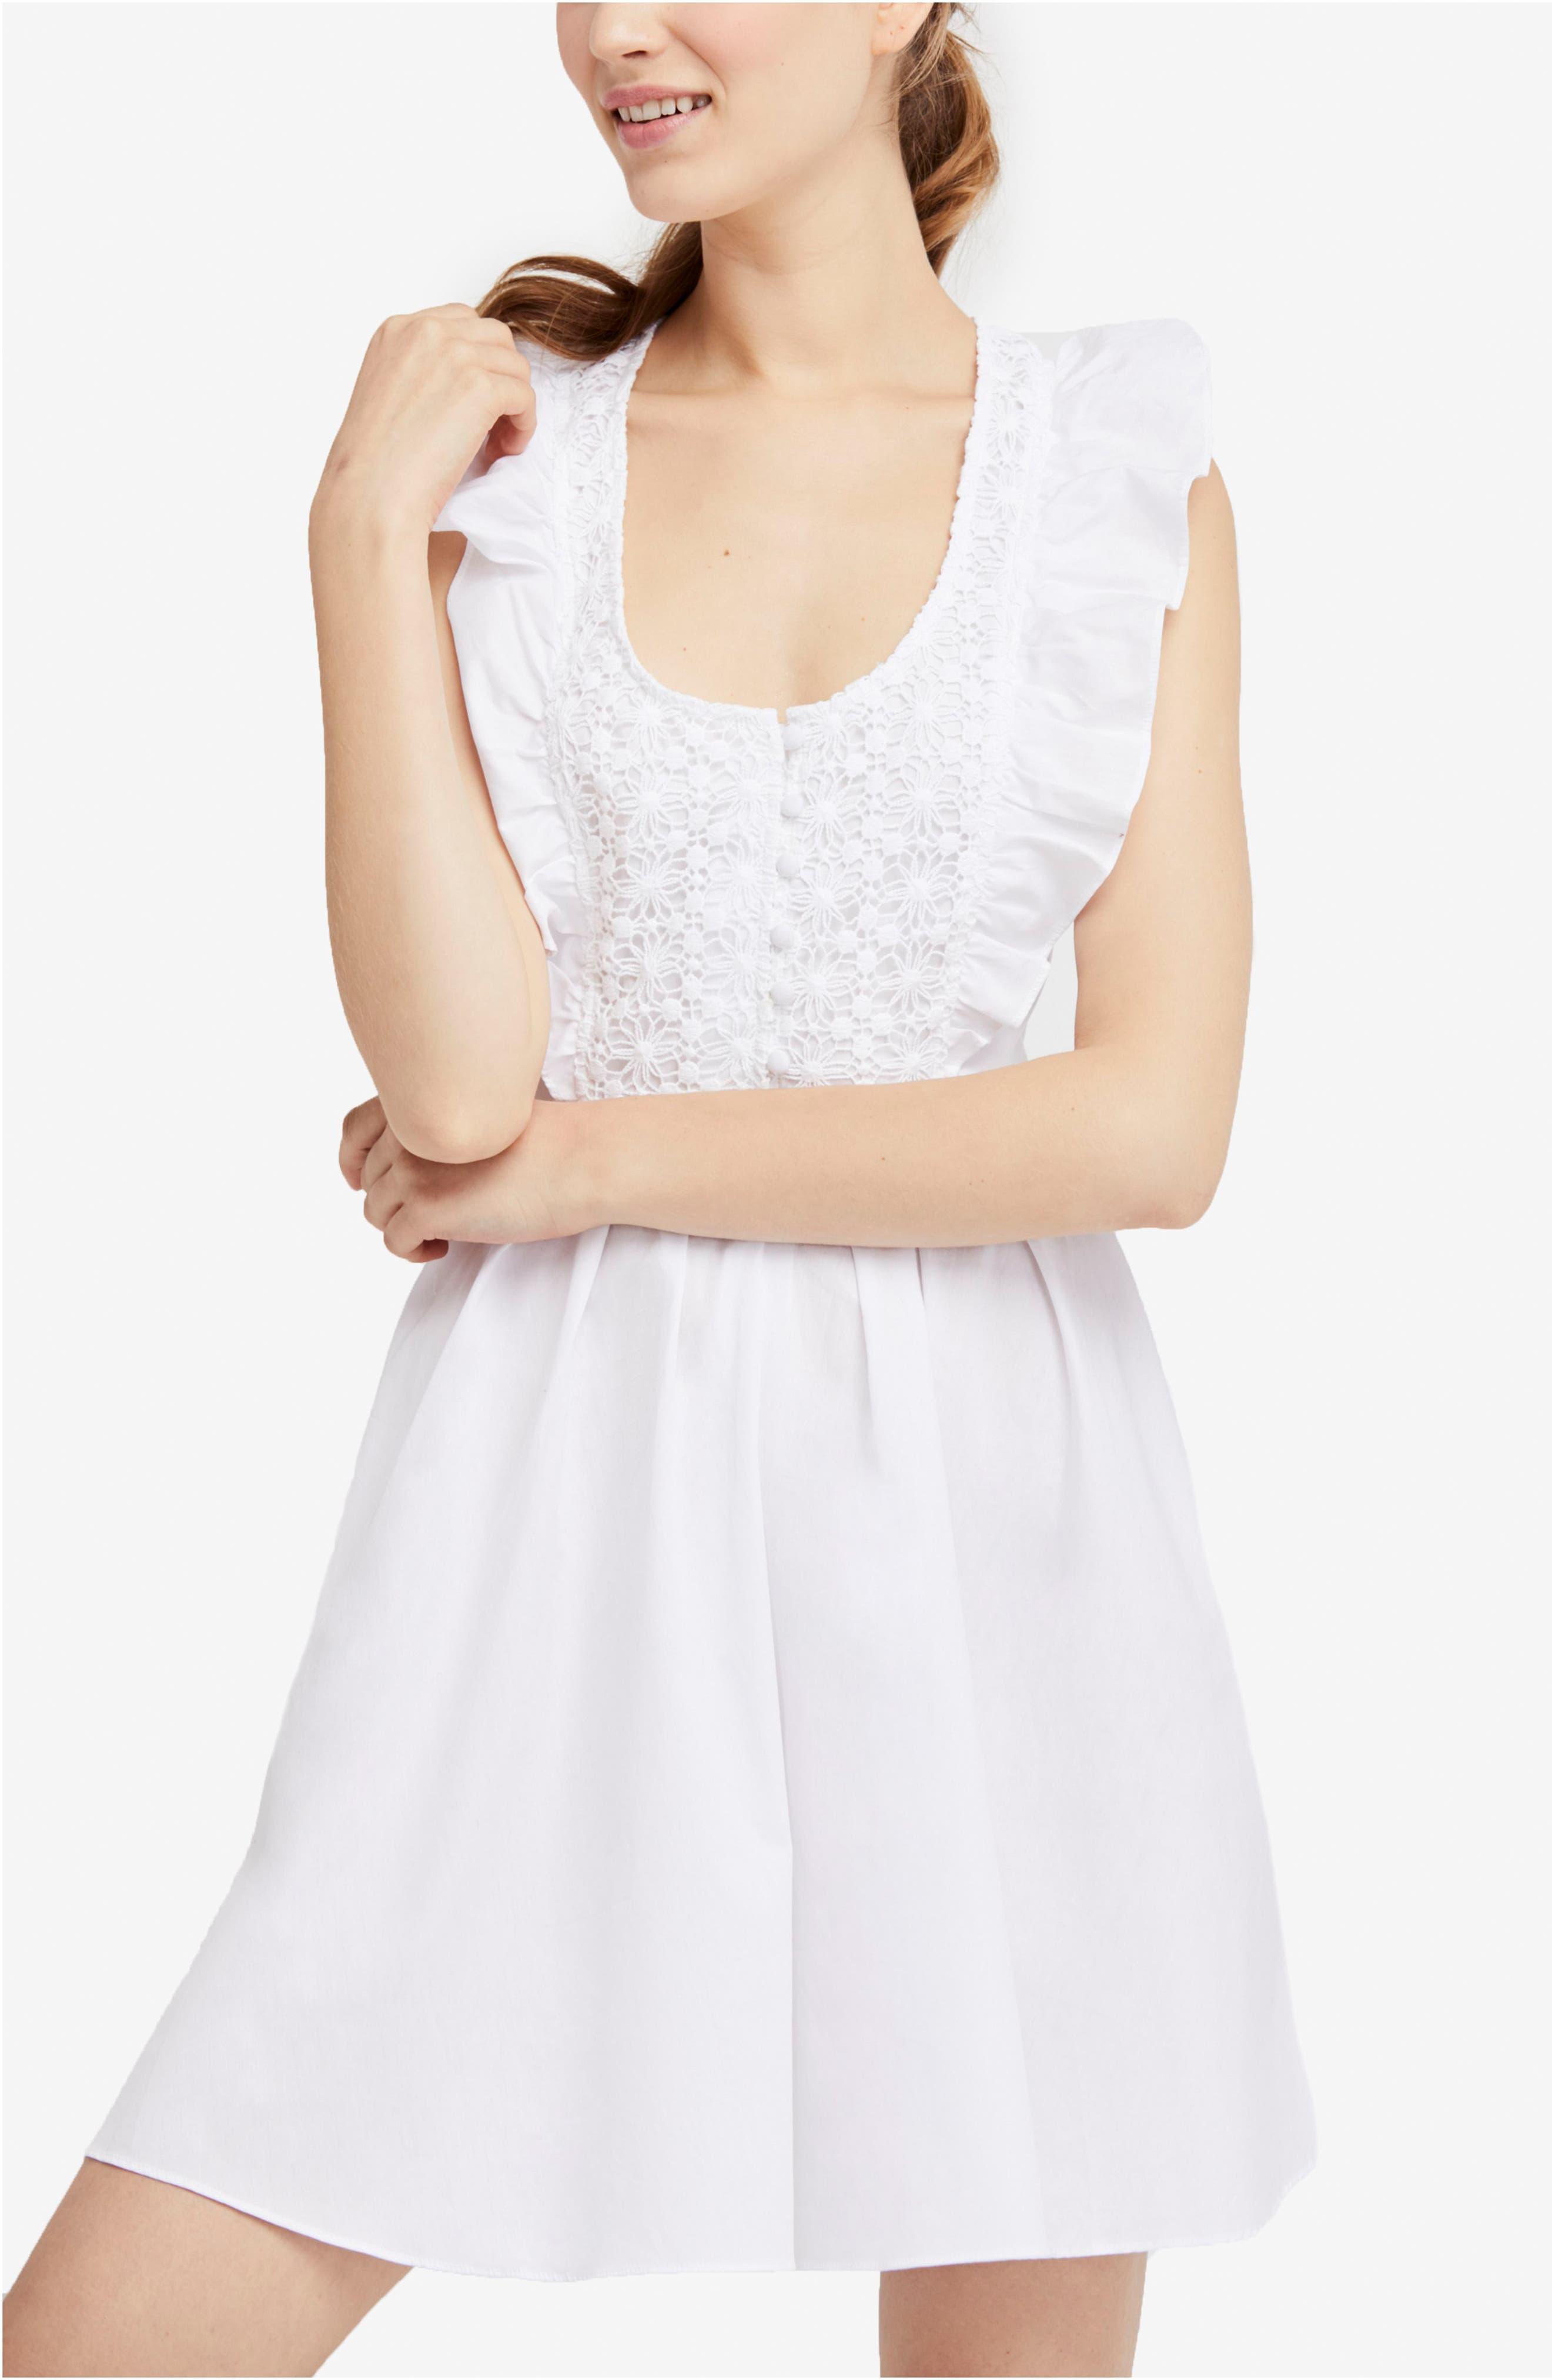 Half Moon Minidress,                             Main thumbnail 1, color,                             White